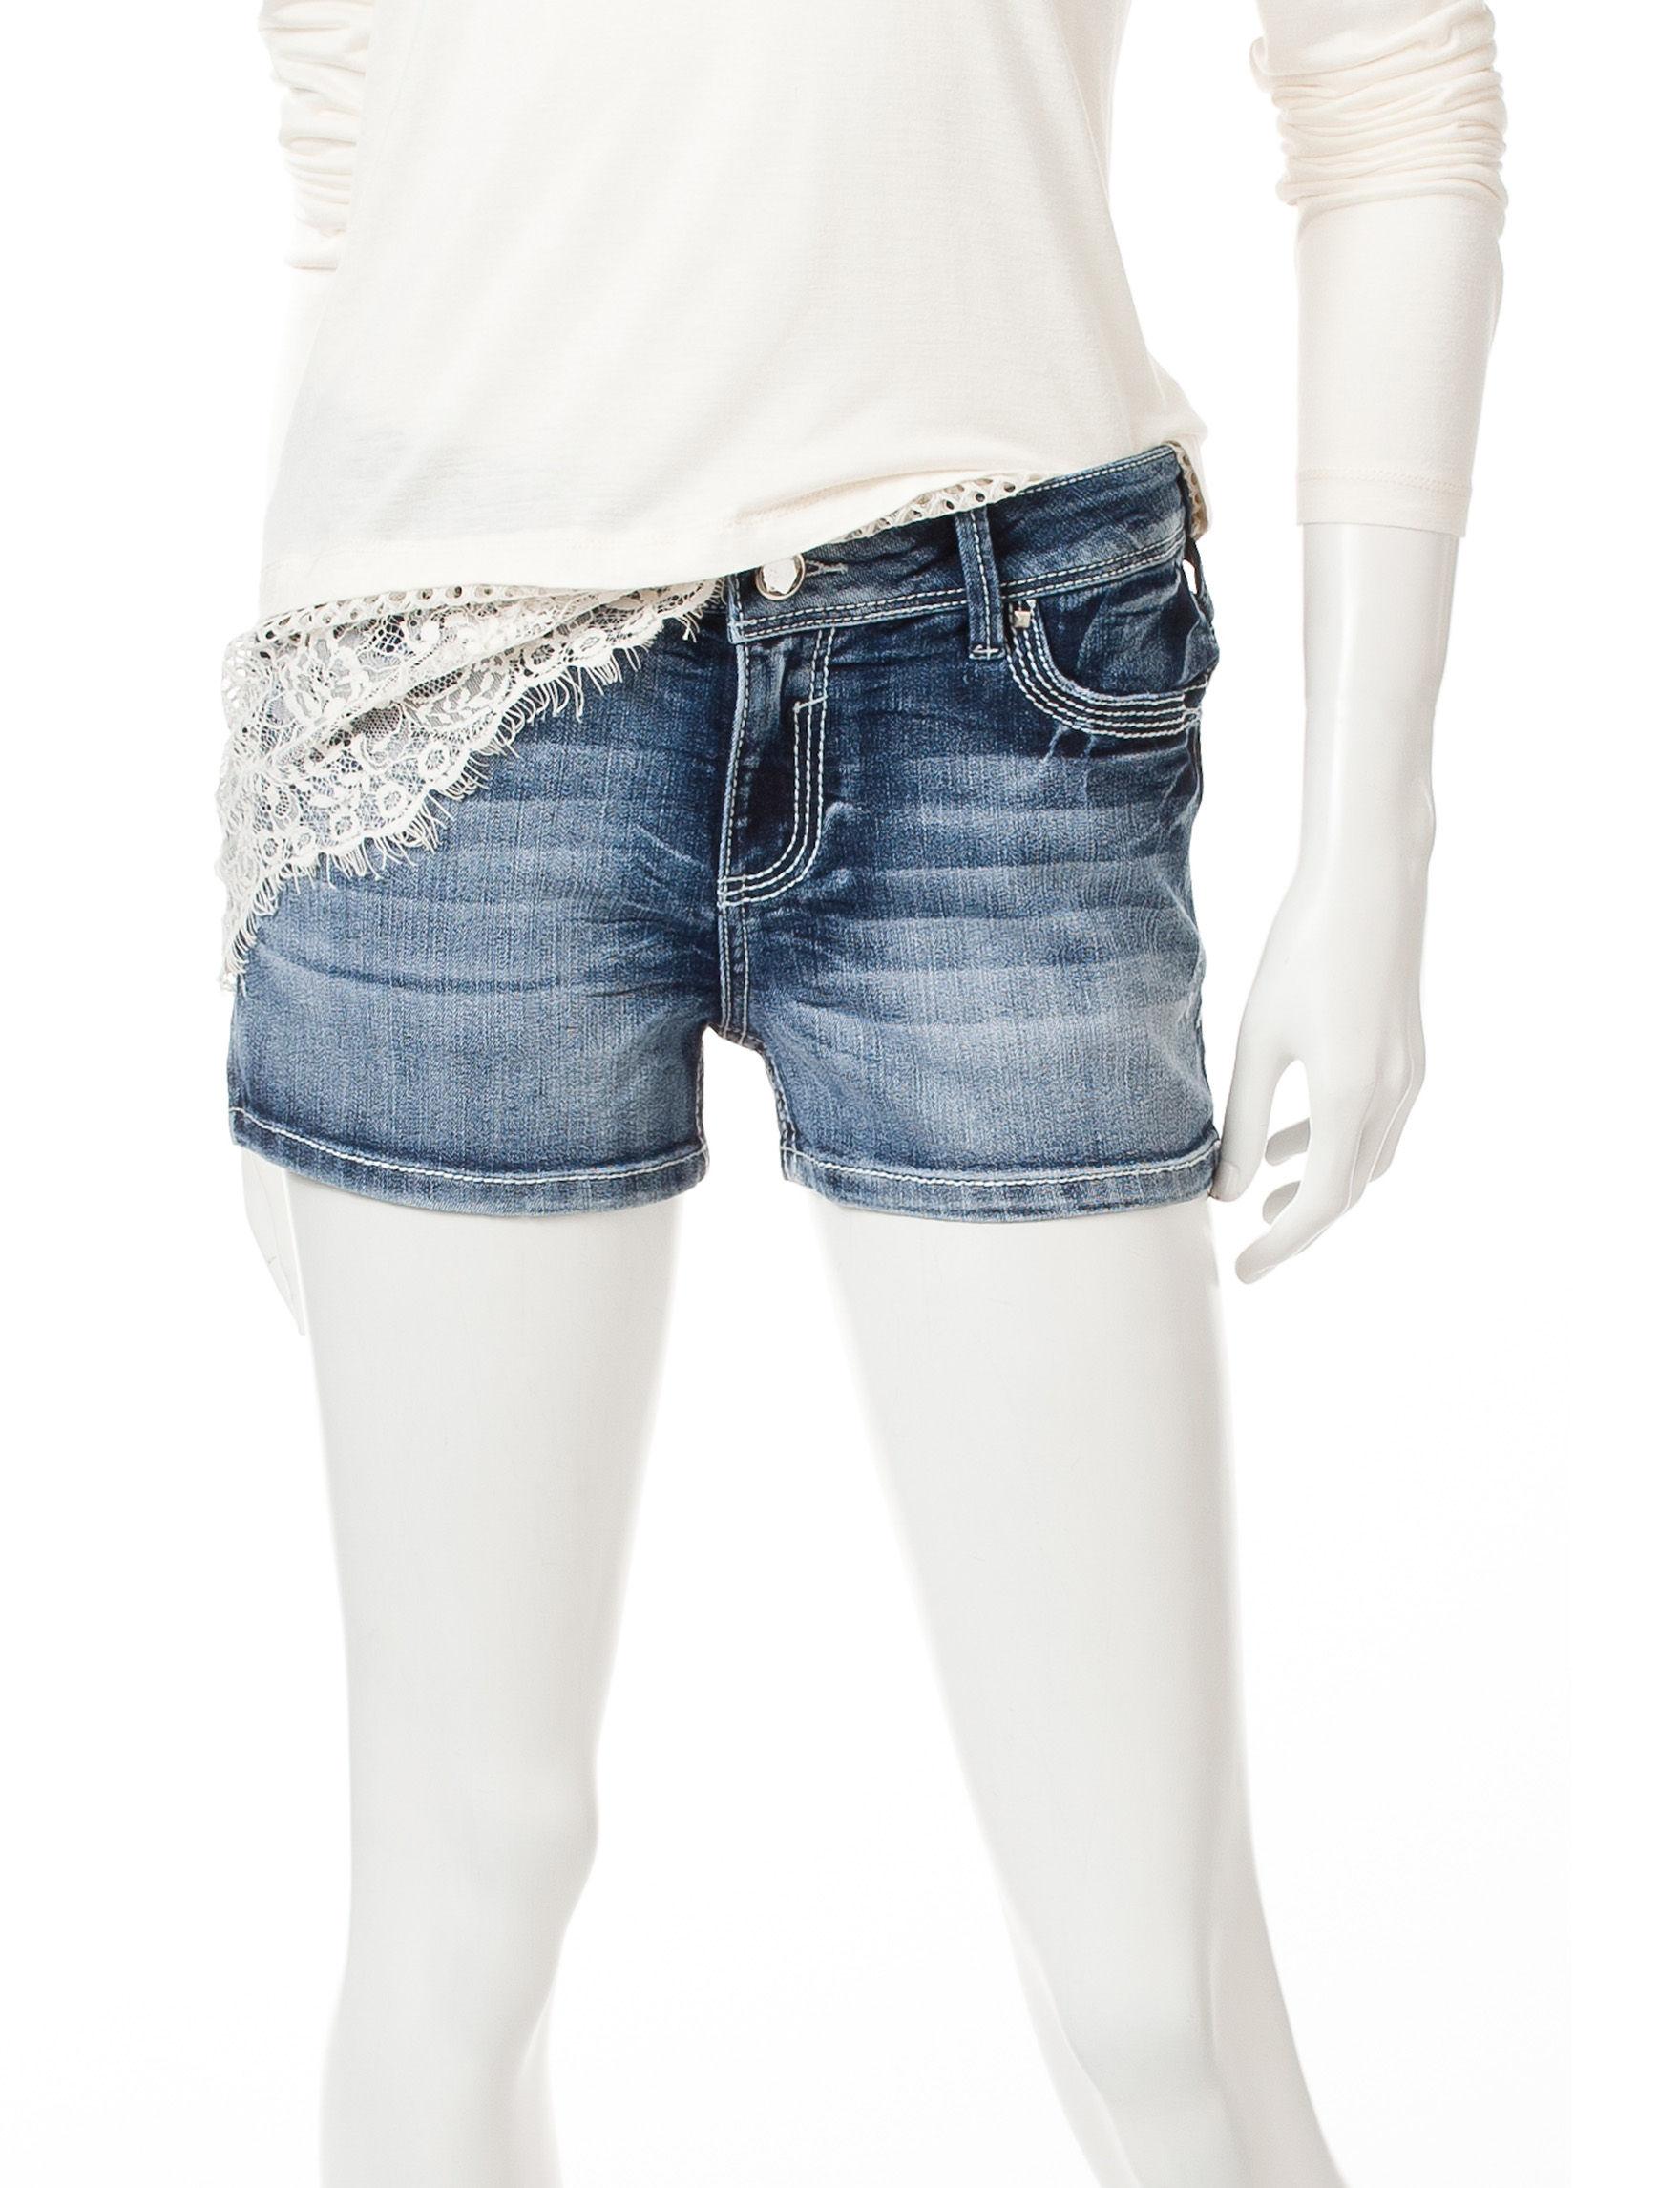 Amethyst Dark Blue - Rinse Denim Shorts